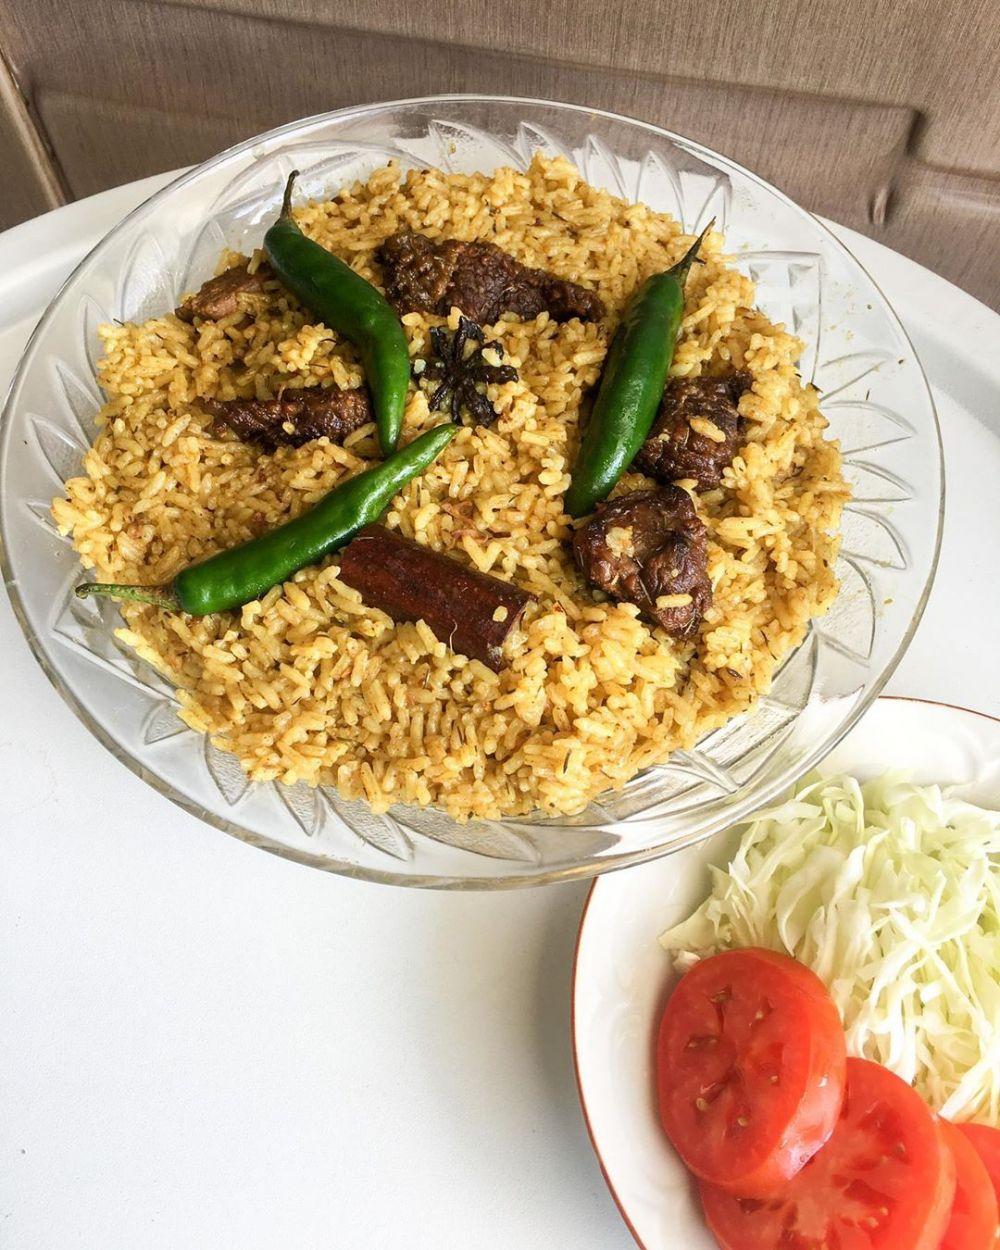 Resep nasi kebuli © 2020 brilio.net